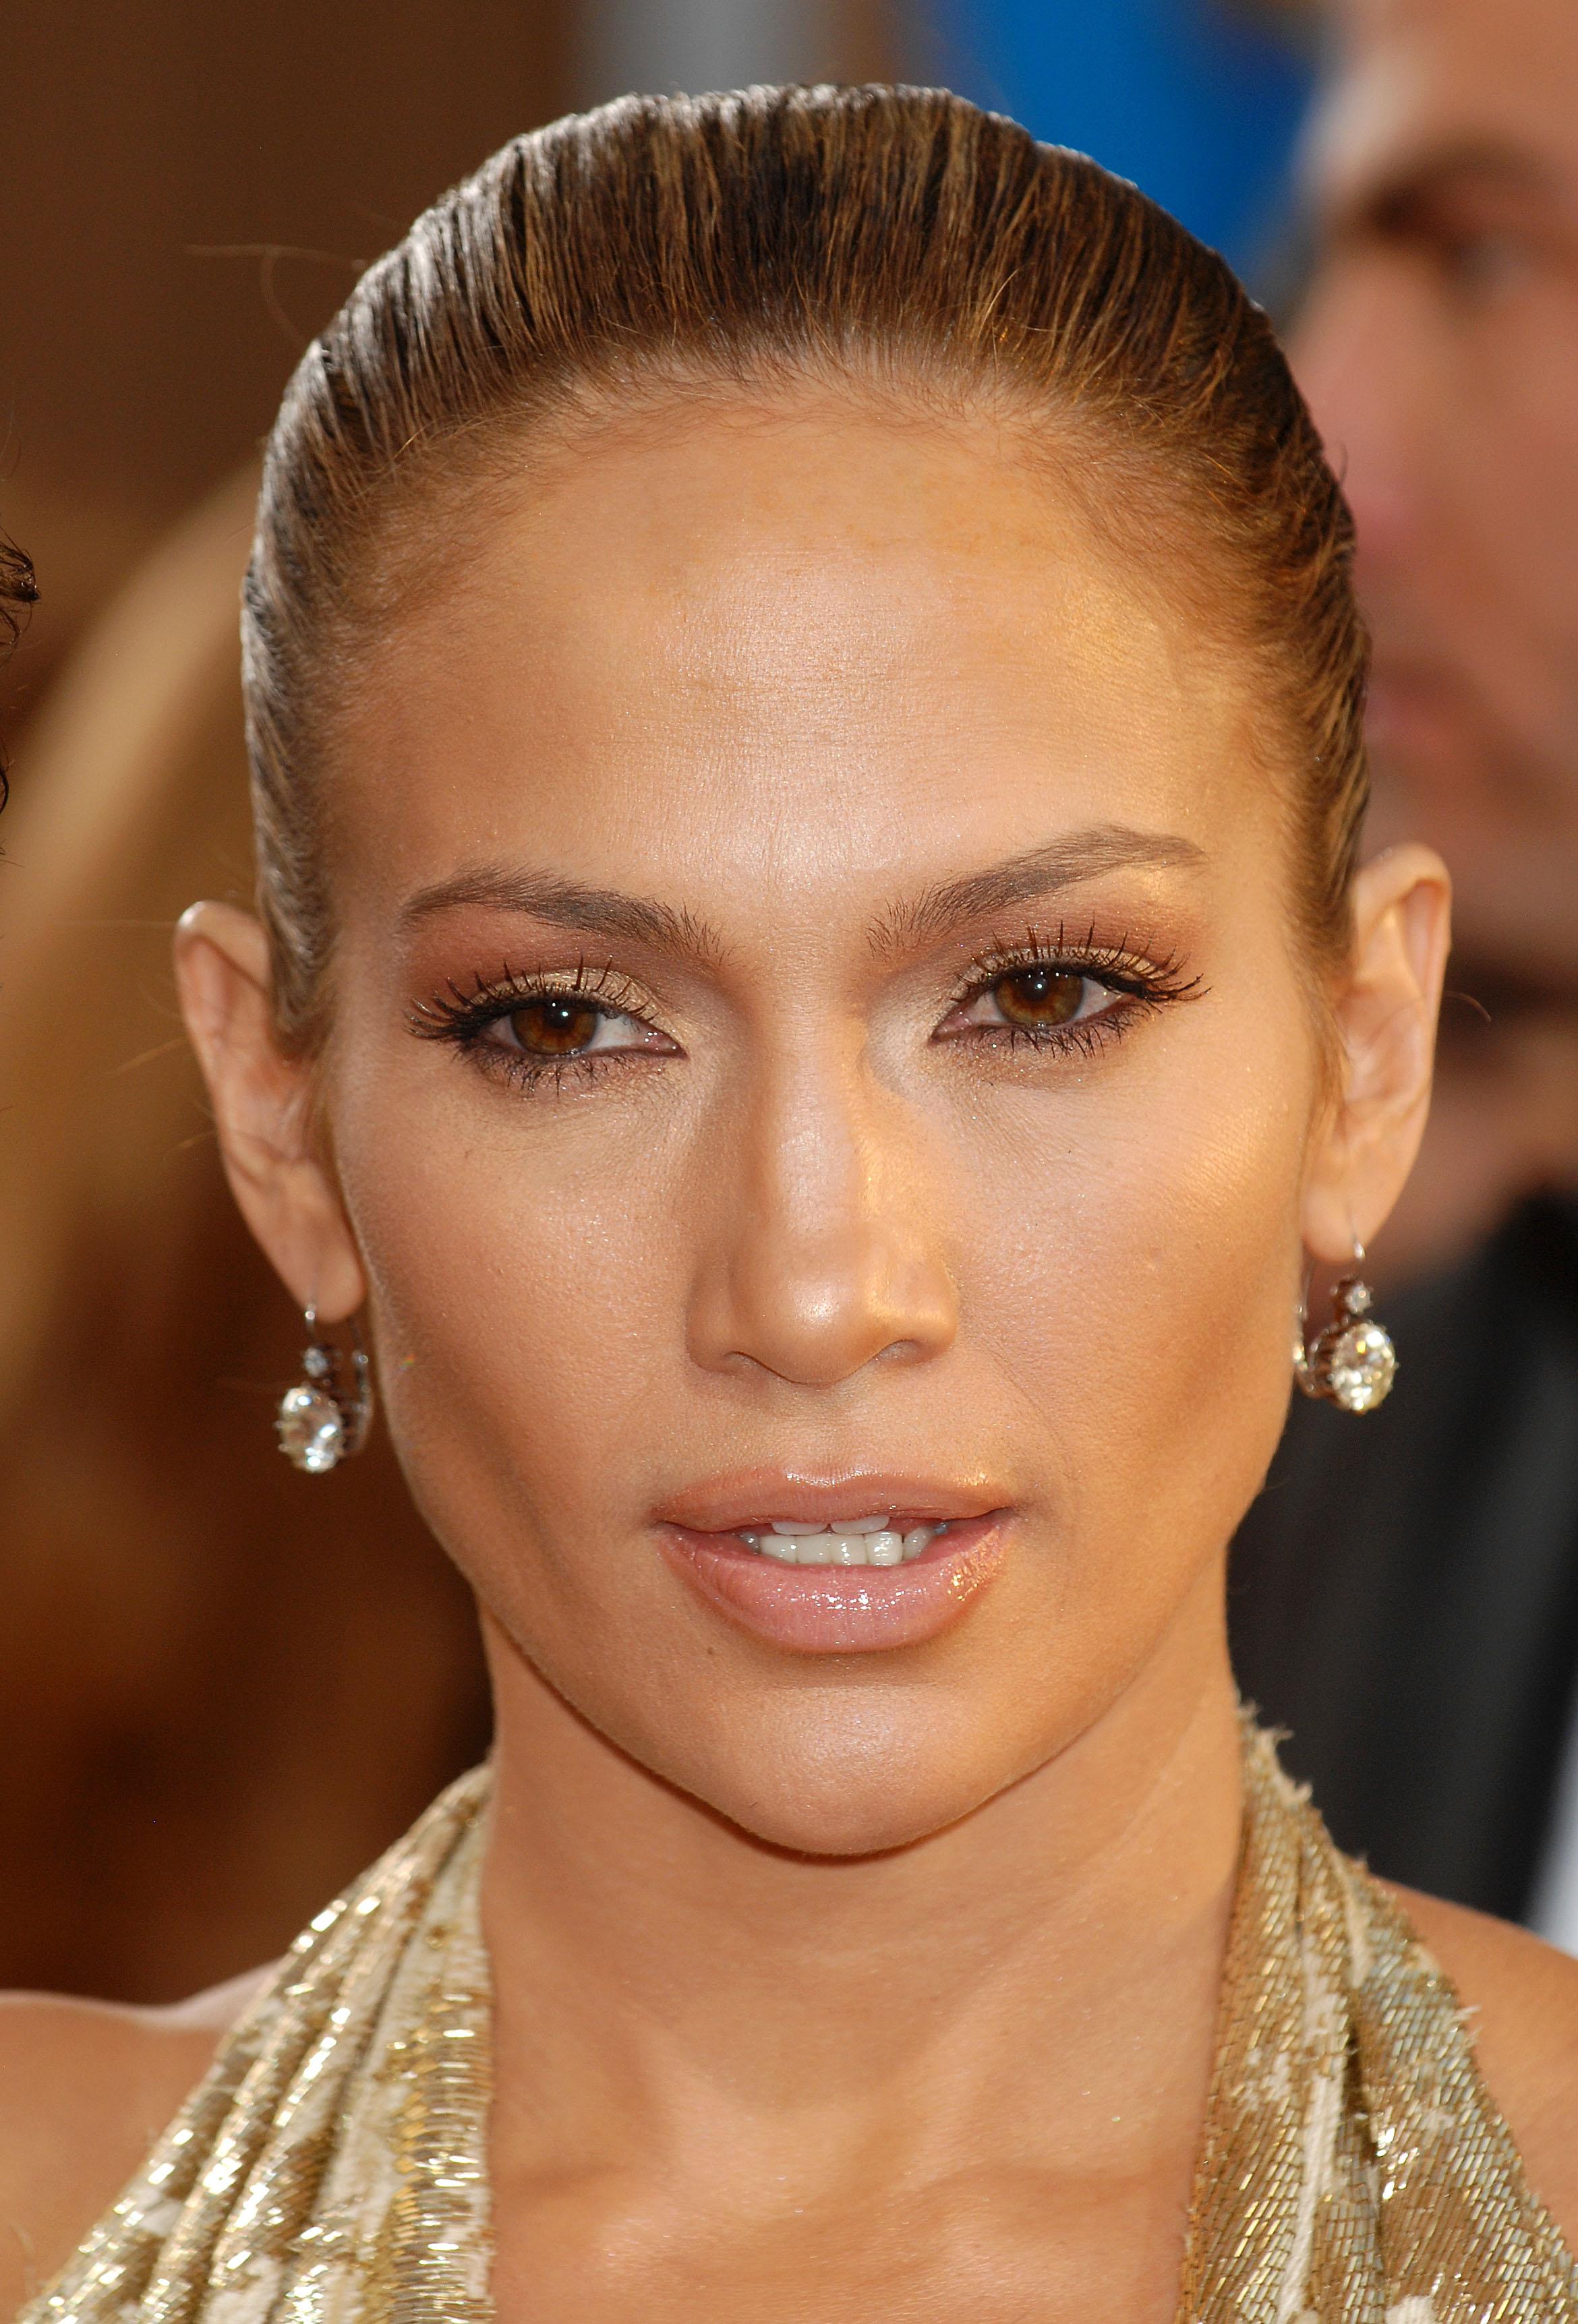 29574_Celebutopia-Jennifer_Lopez_arrives_at_the_66th_Annual_Golden_Globe_Awards-05_122_227lo.JPG